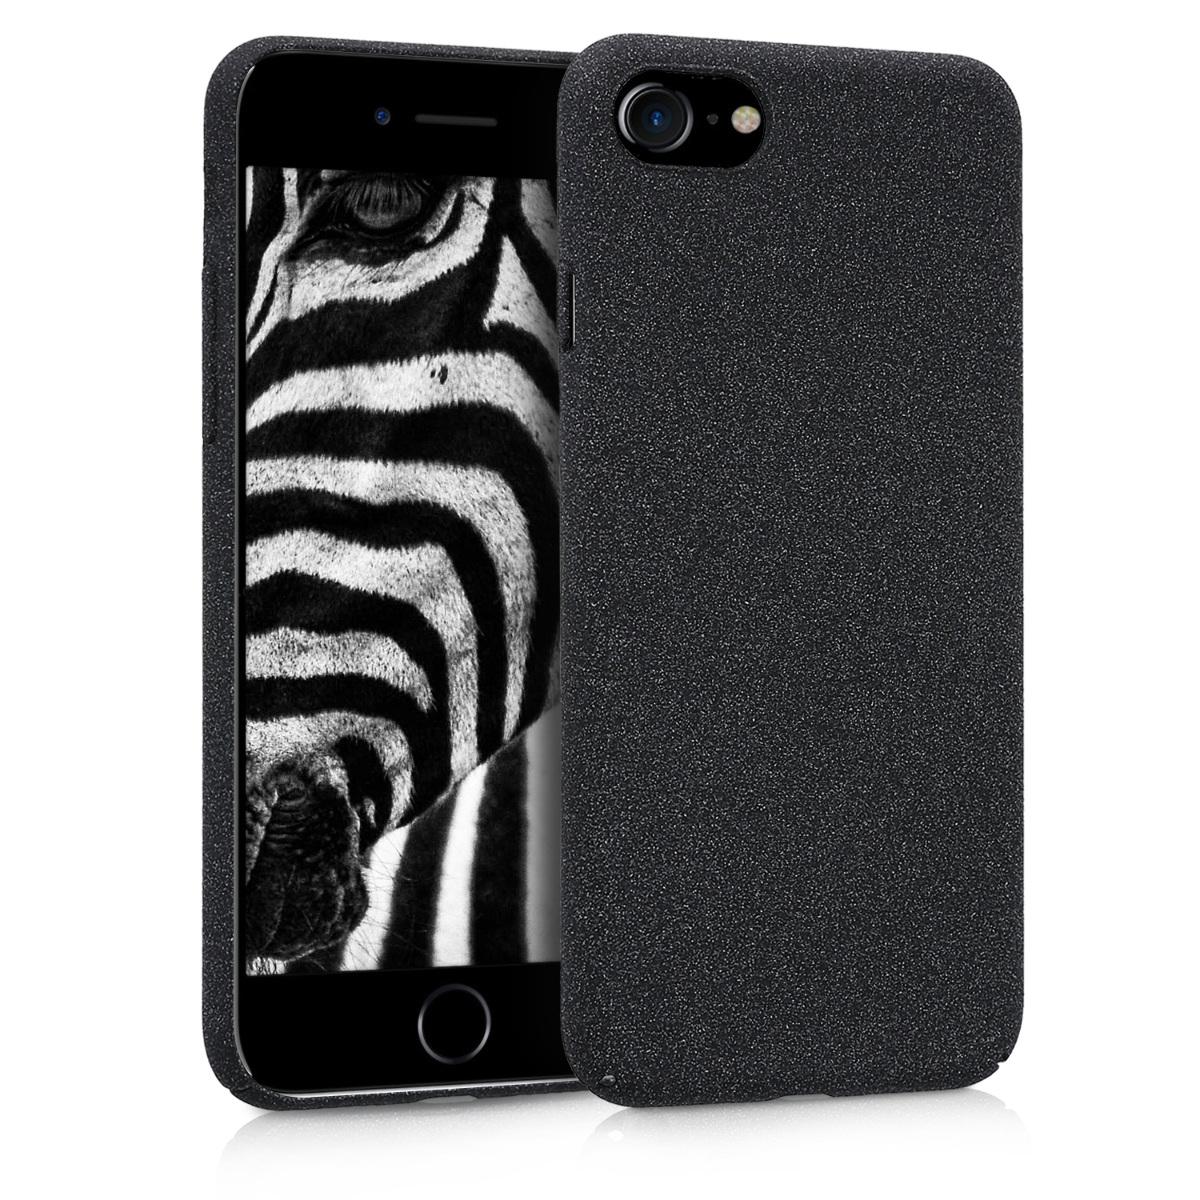 KW Slim Anti-Slip Cover - Σκληρή Θήκη Καουτσούκ iPhone 8 / 7 - Μαύρο μεταλλικό (43629.68)